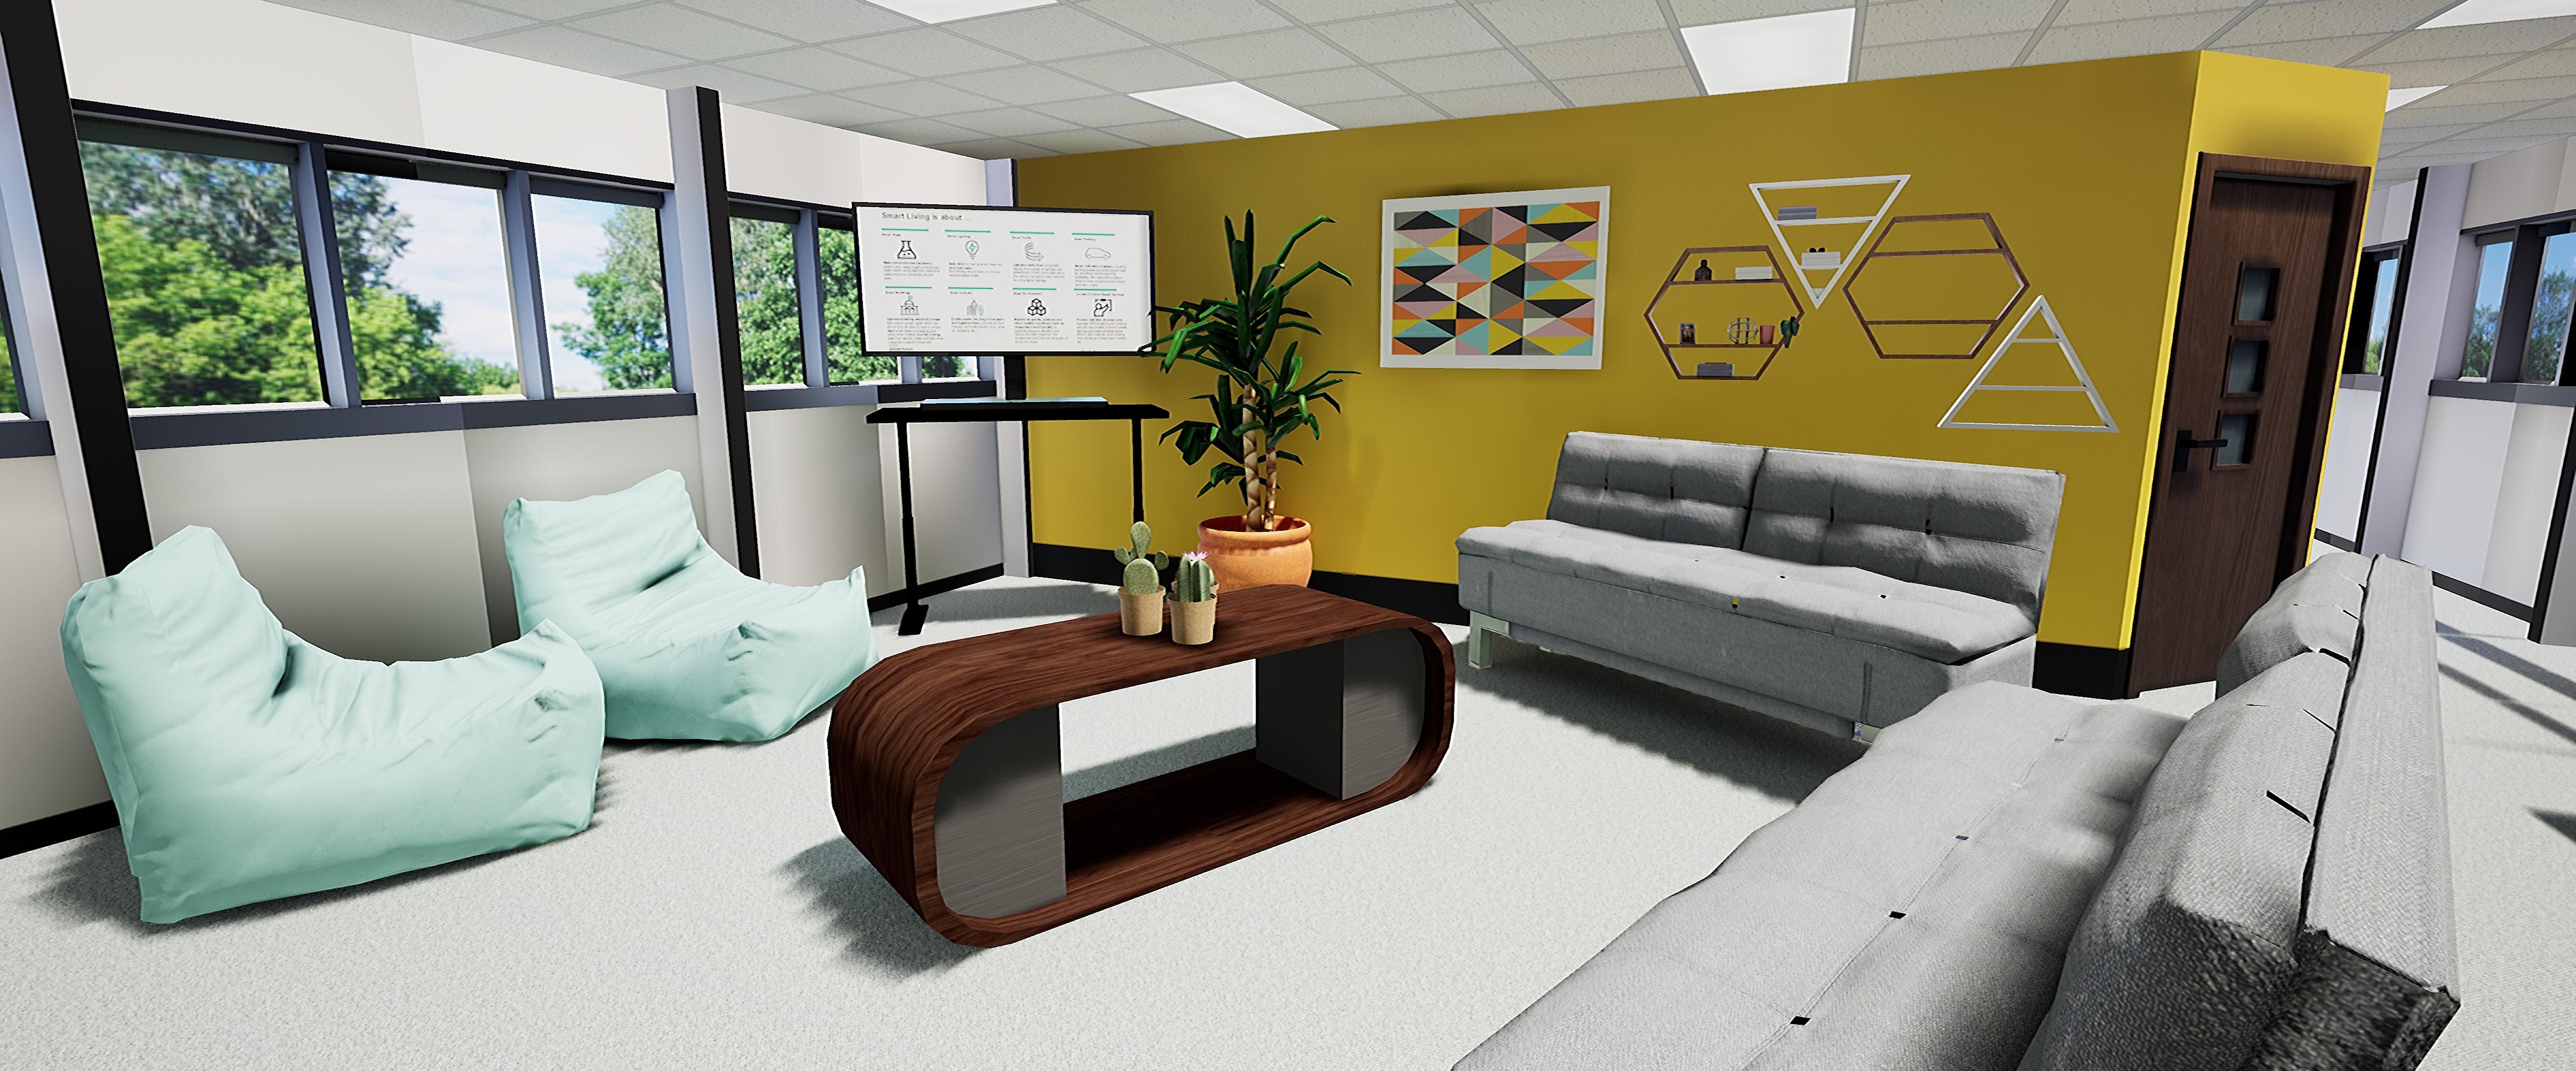 Adastral-Park Oberon-Office (6)